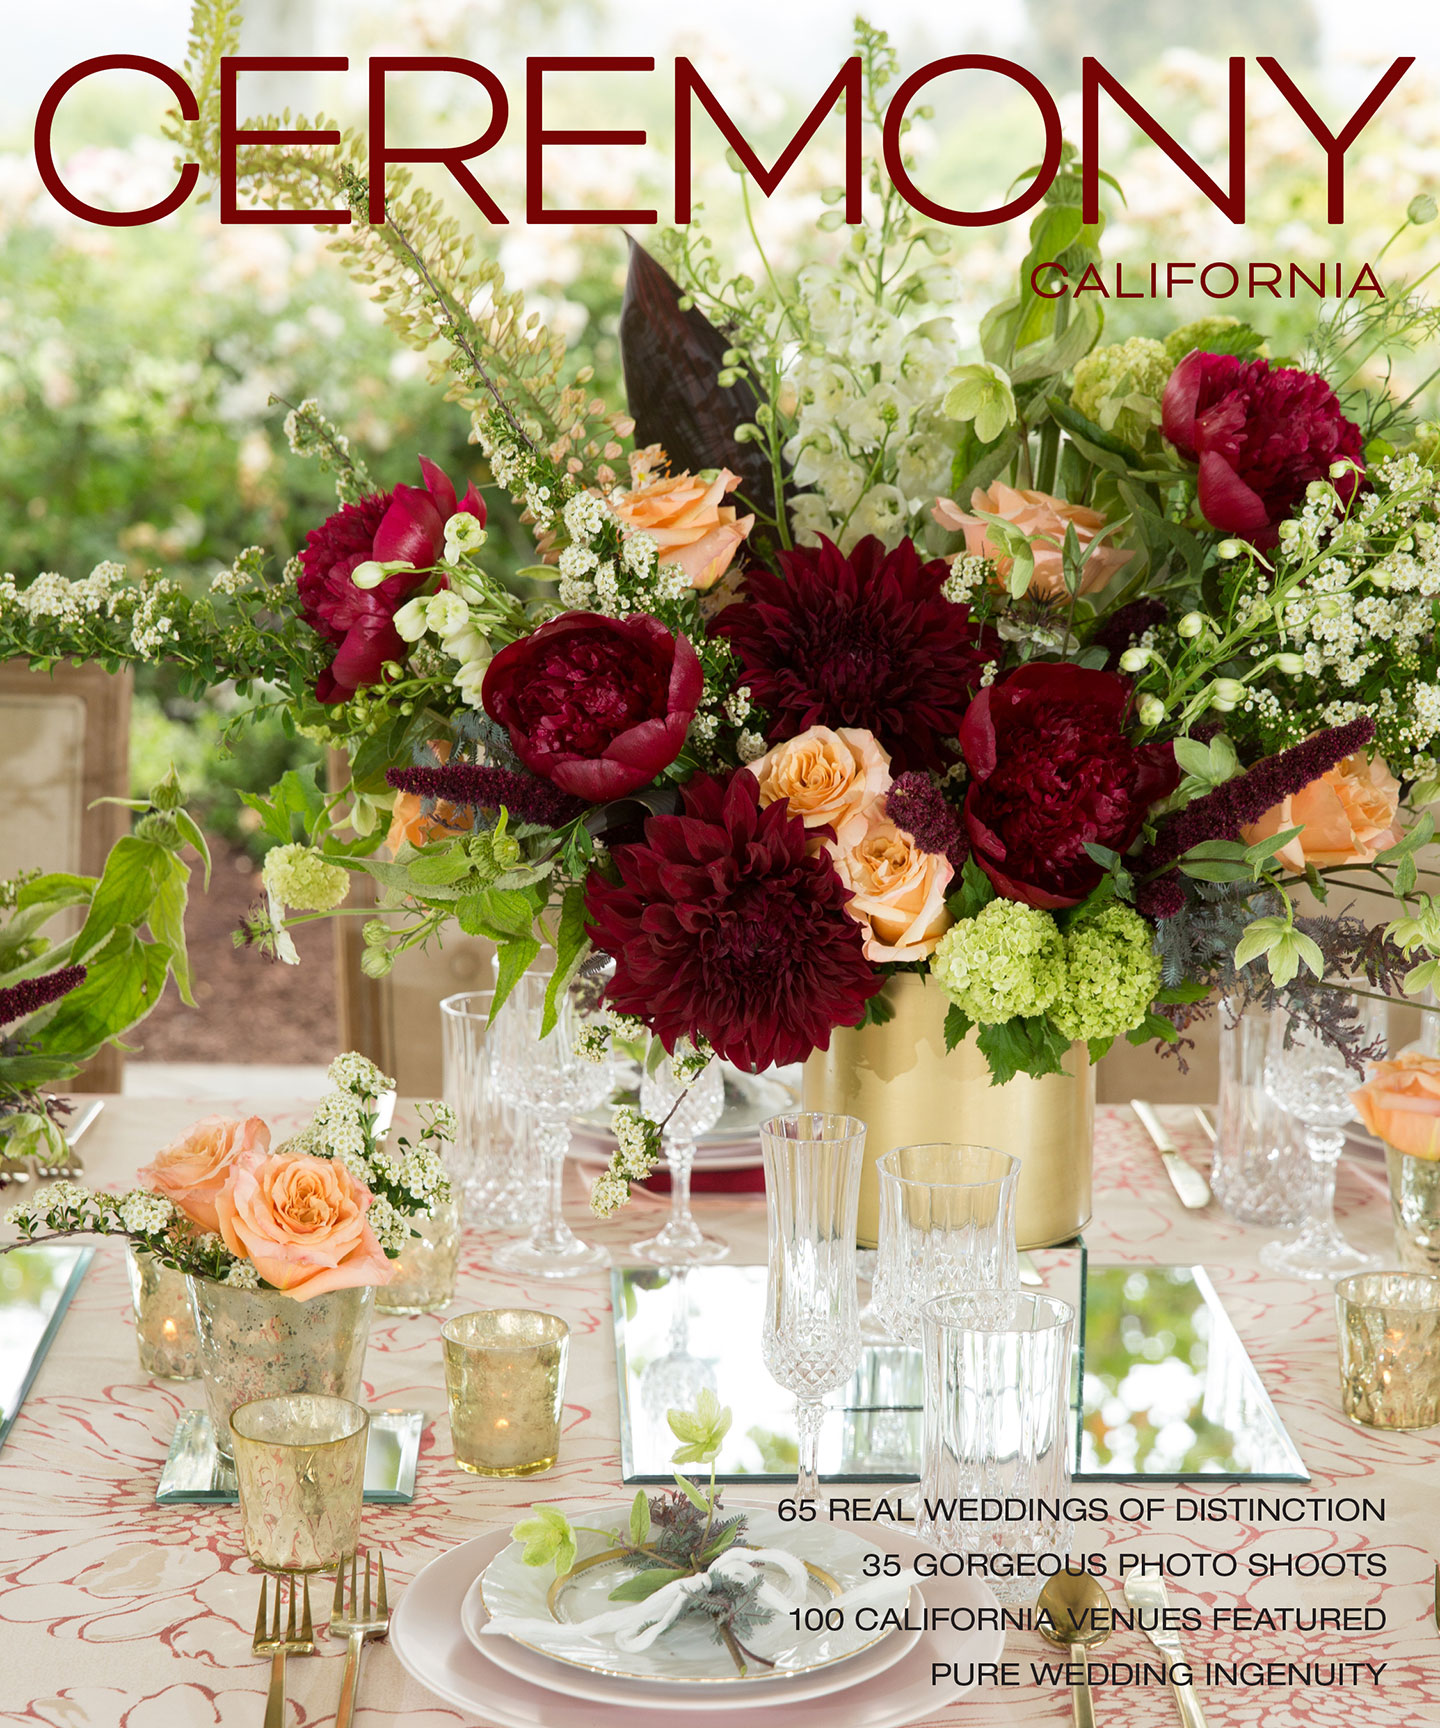 CEREMONY CA18-covers-02.jpg